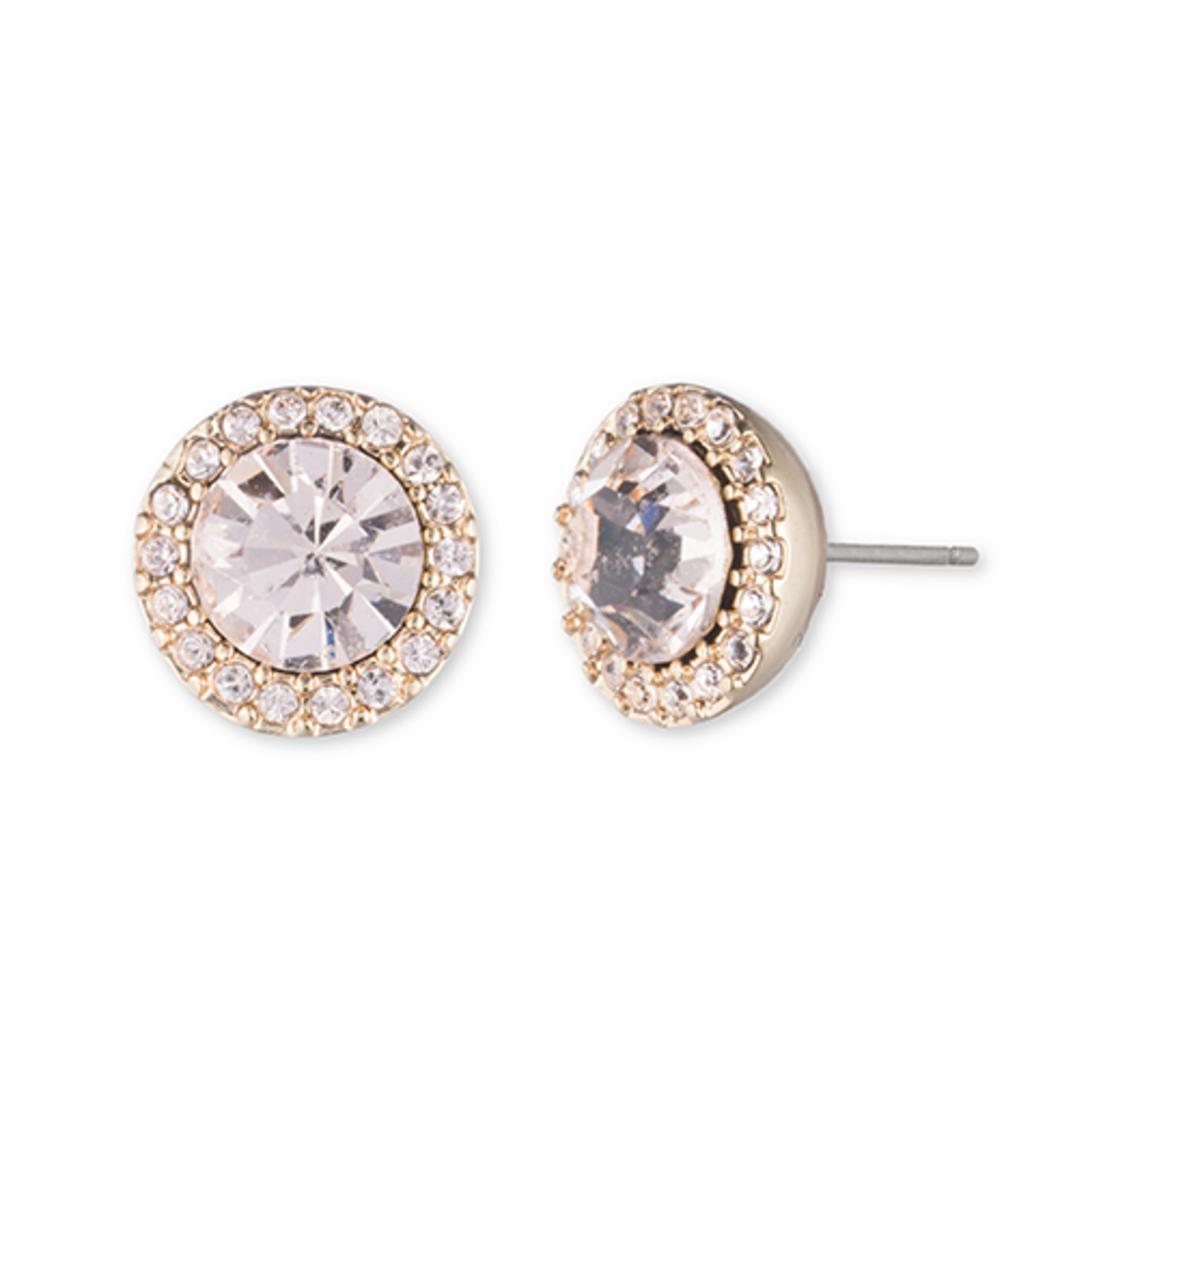 Studded Stone Earrings